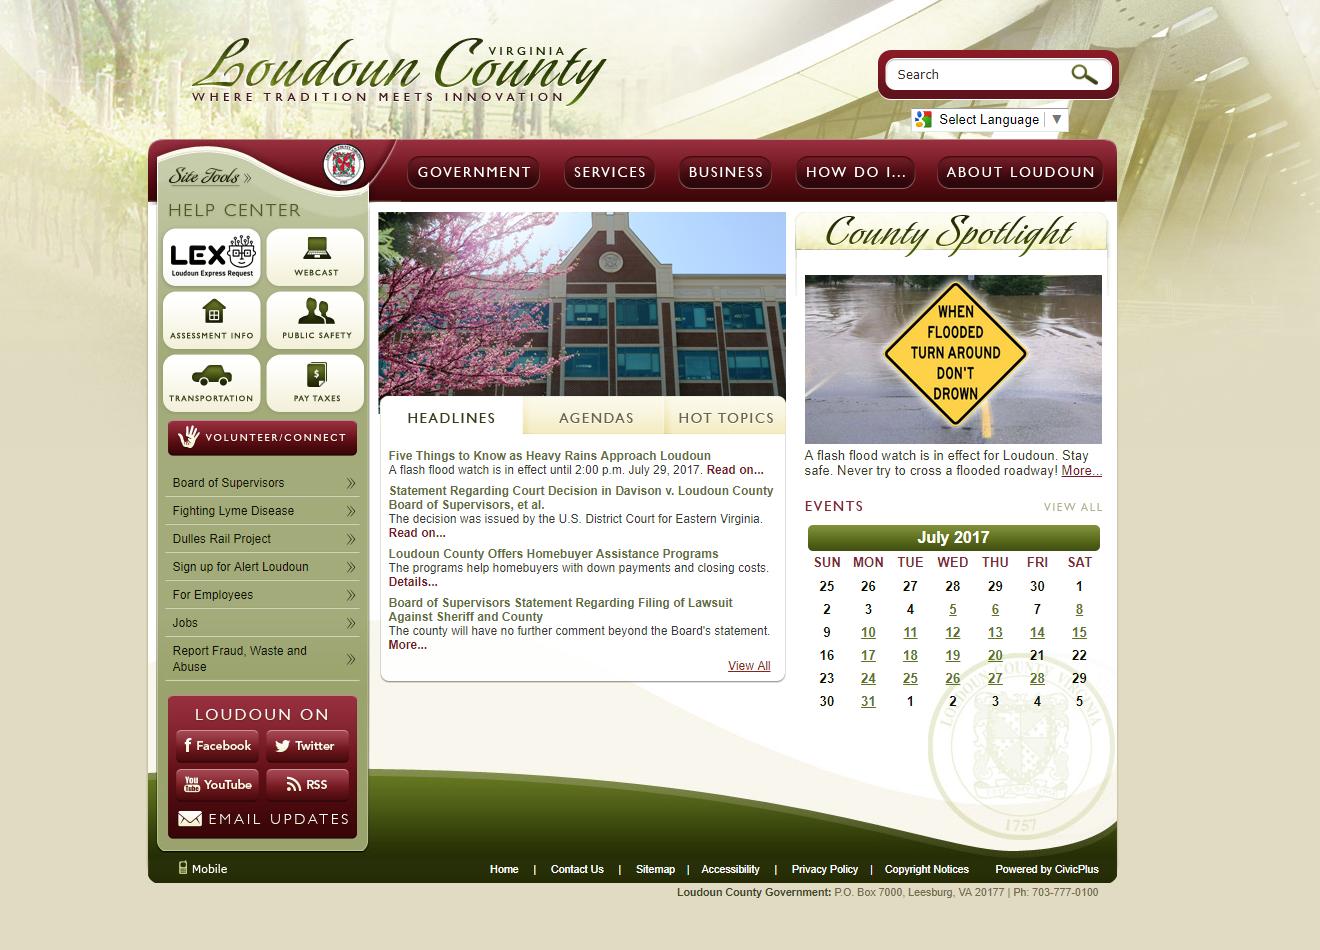 2016_Digital_Counties_Survey_Winner_Loudoun_County_VA_crop.png